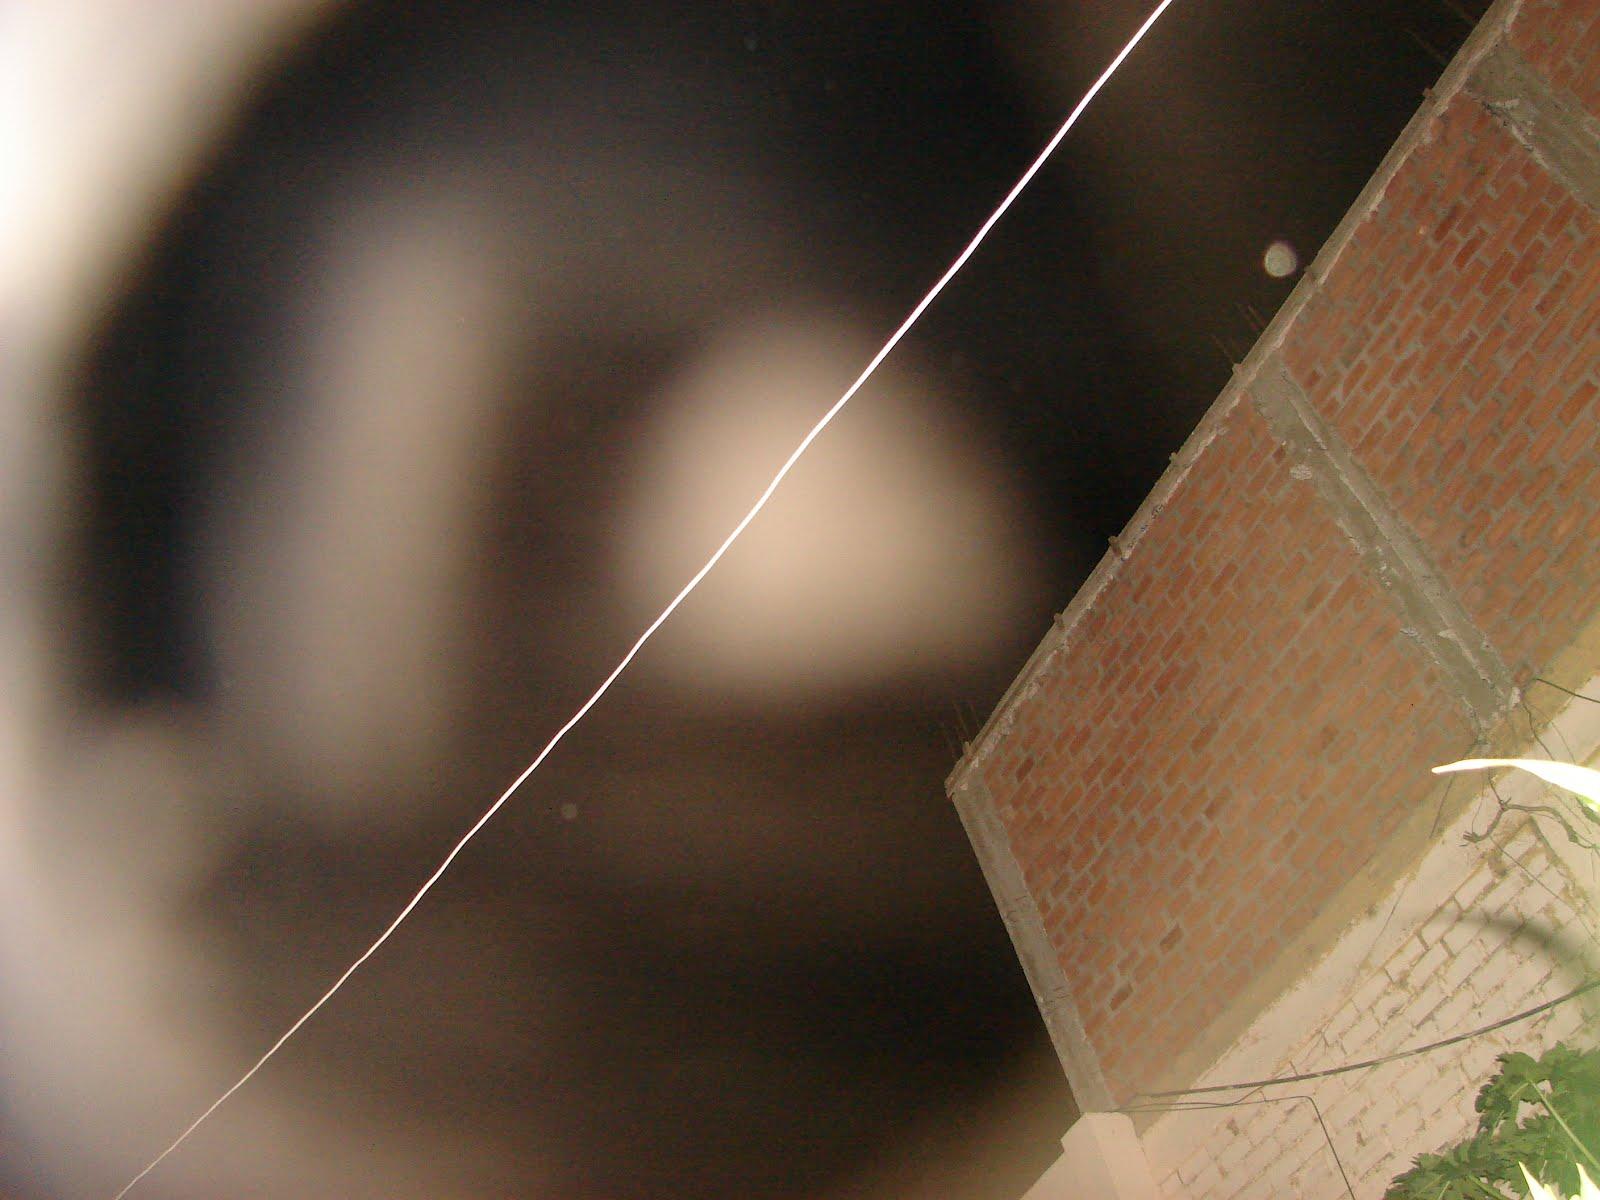 Atencion-23-enero-24-25-26-27-28-29-30...2012...ESPECTACULARES-MENSAJES-ET-Ovni-sec-Huacho-3:54:08-